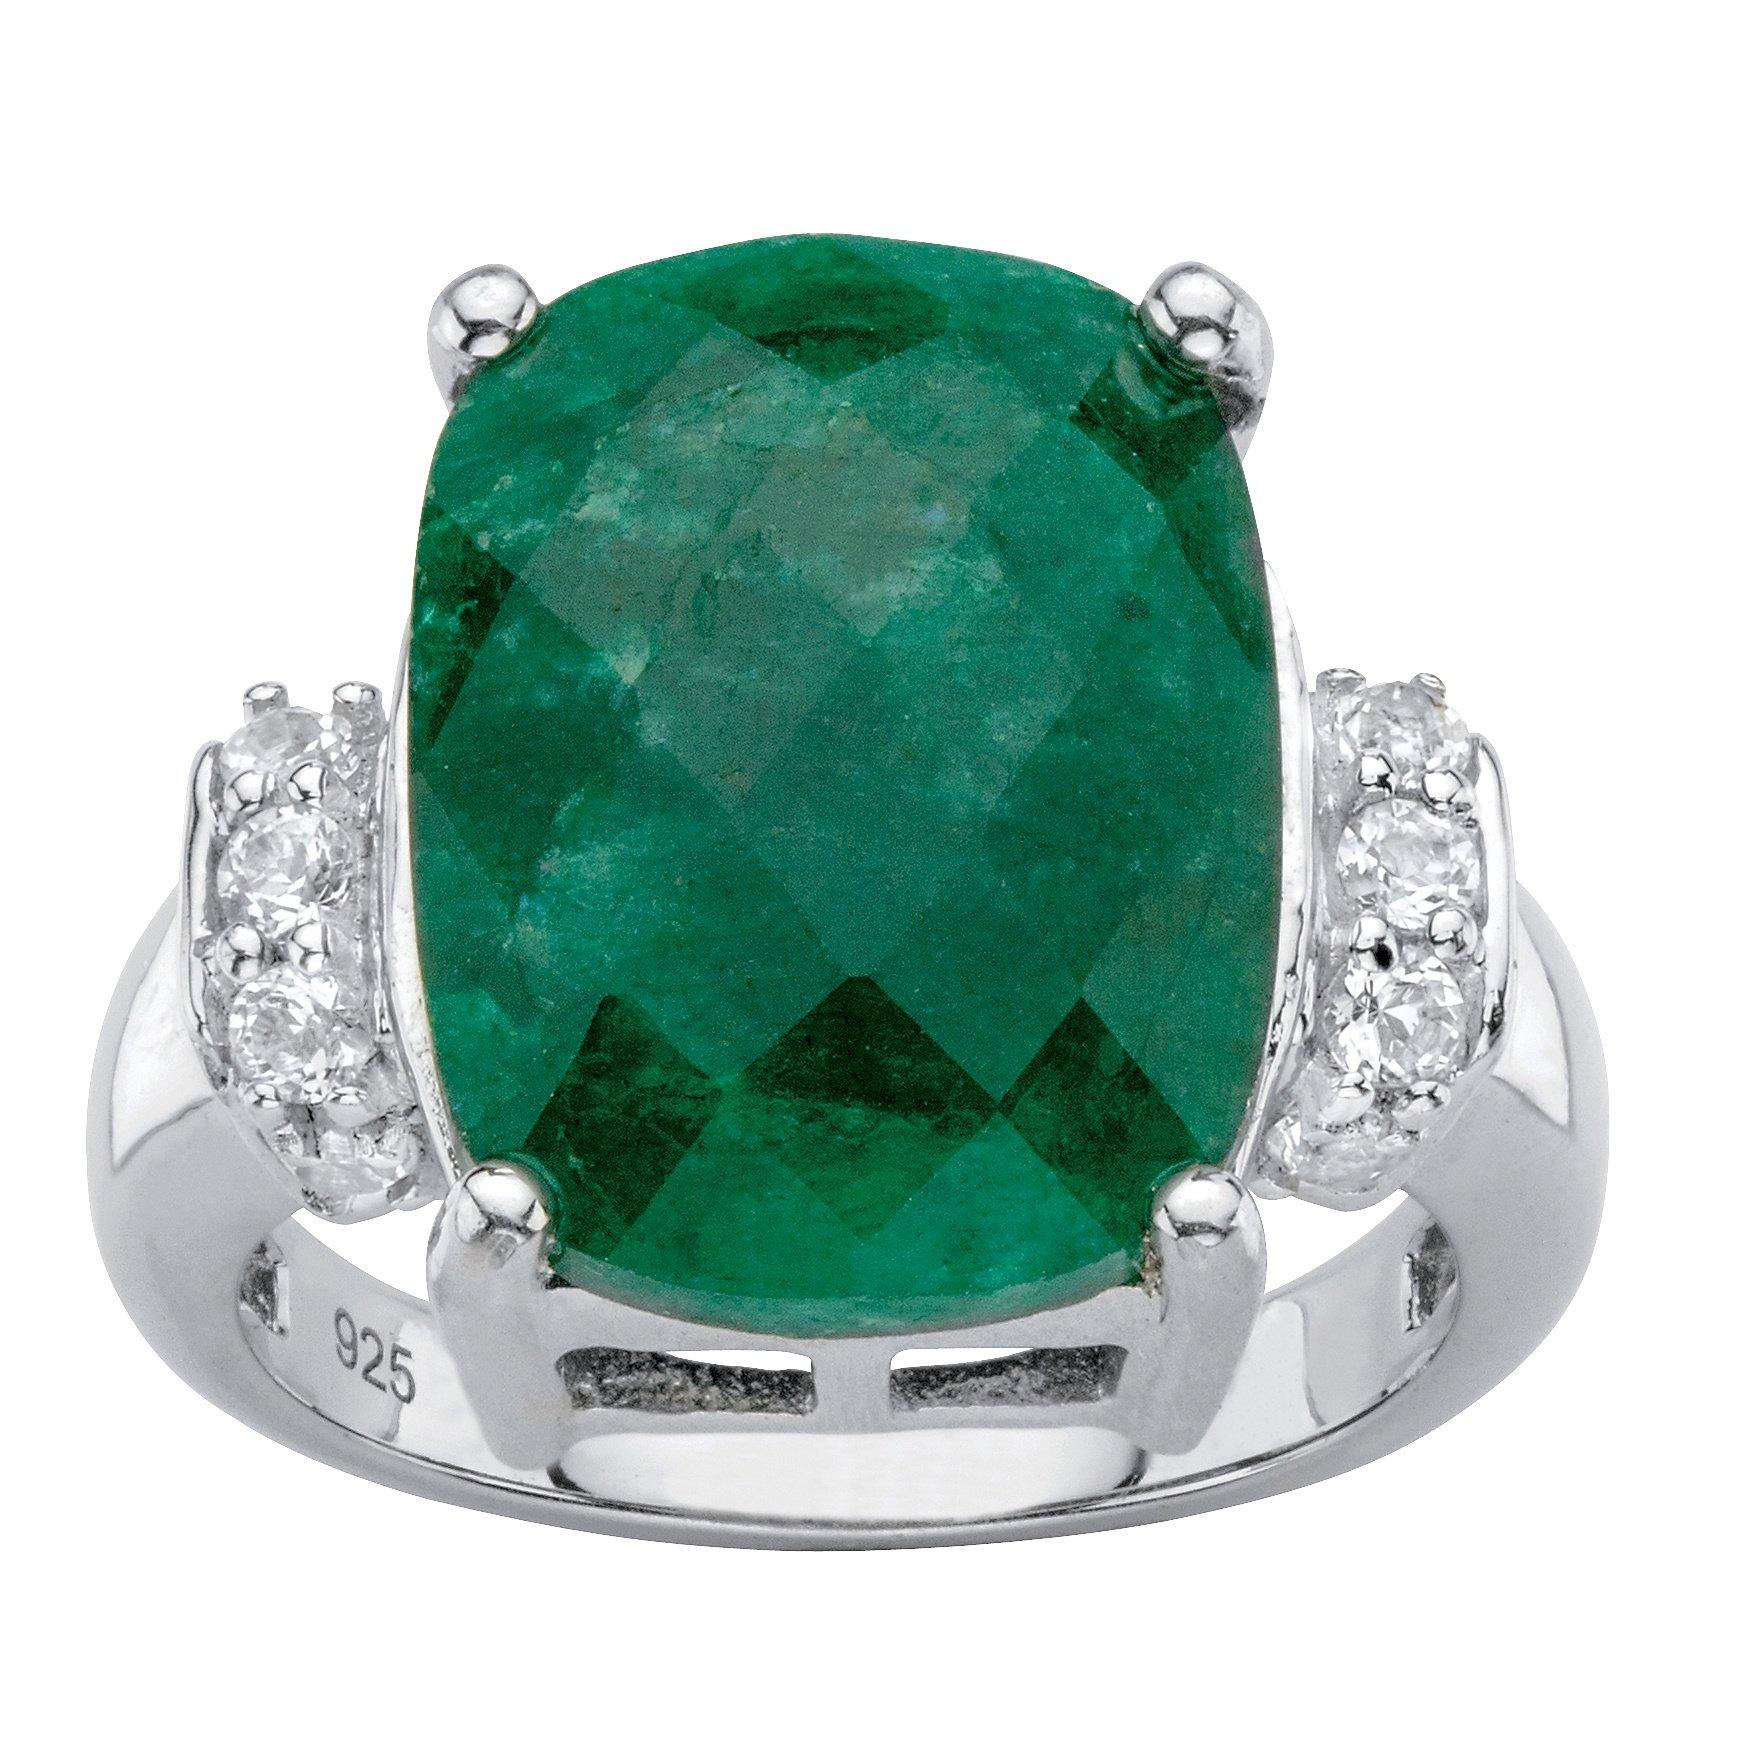 Platinum over .925 Silver Cushion Cut Genuine Emerald and White Tanzanite Ring Size 10